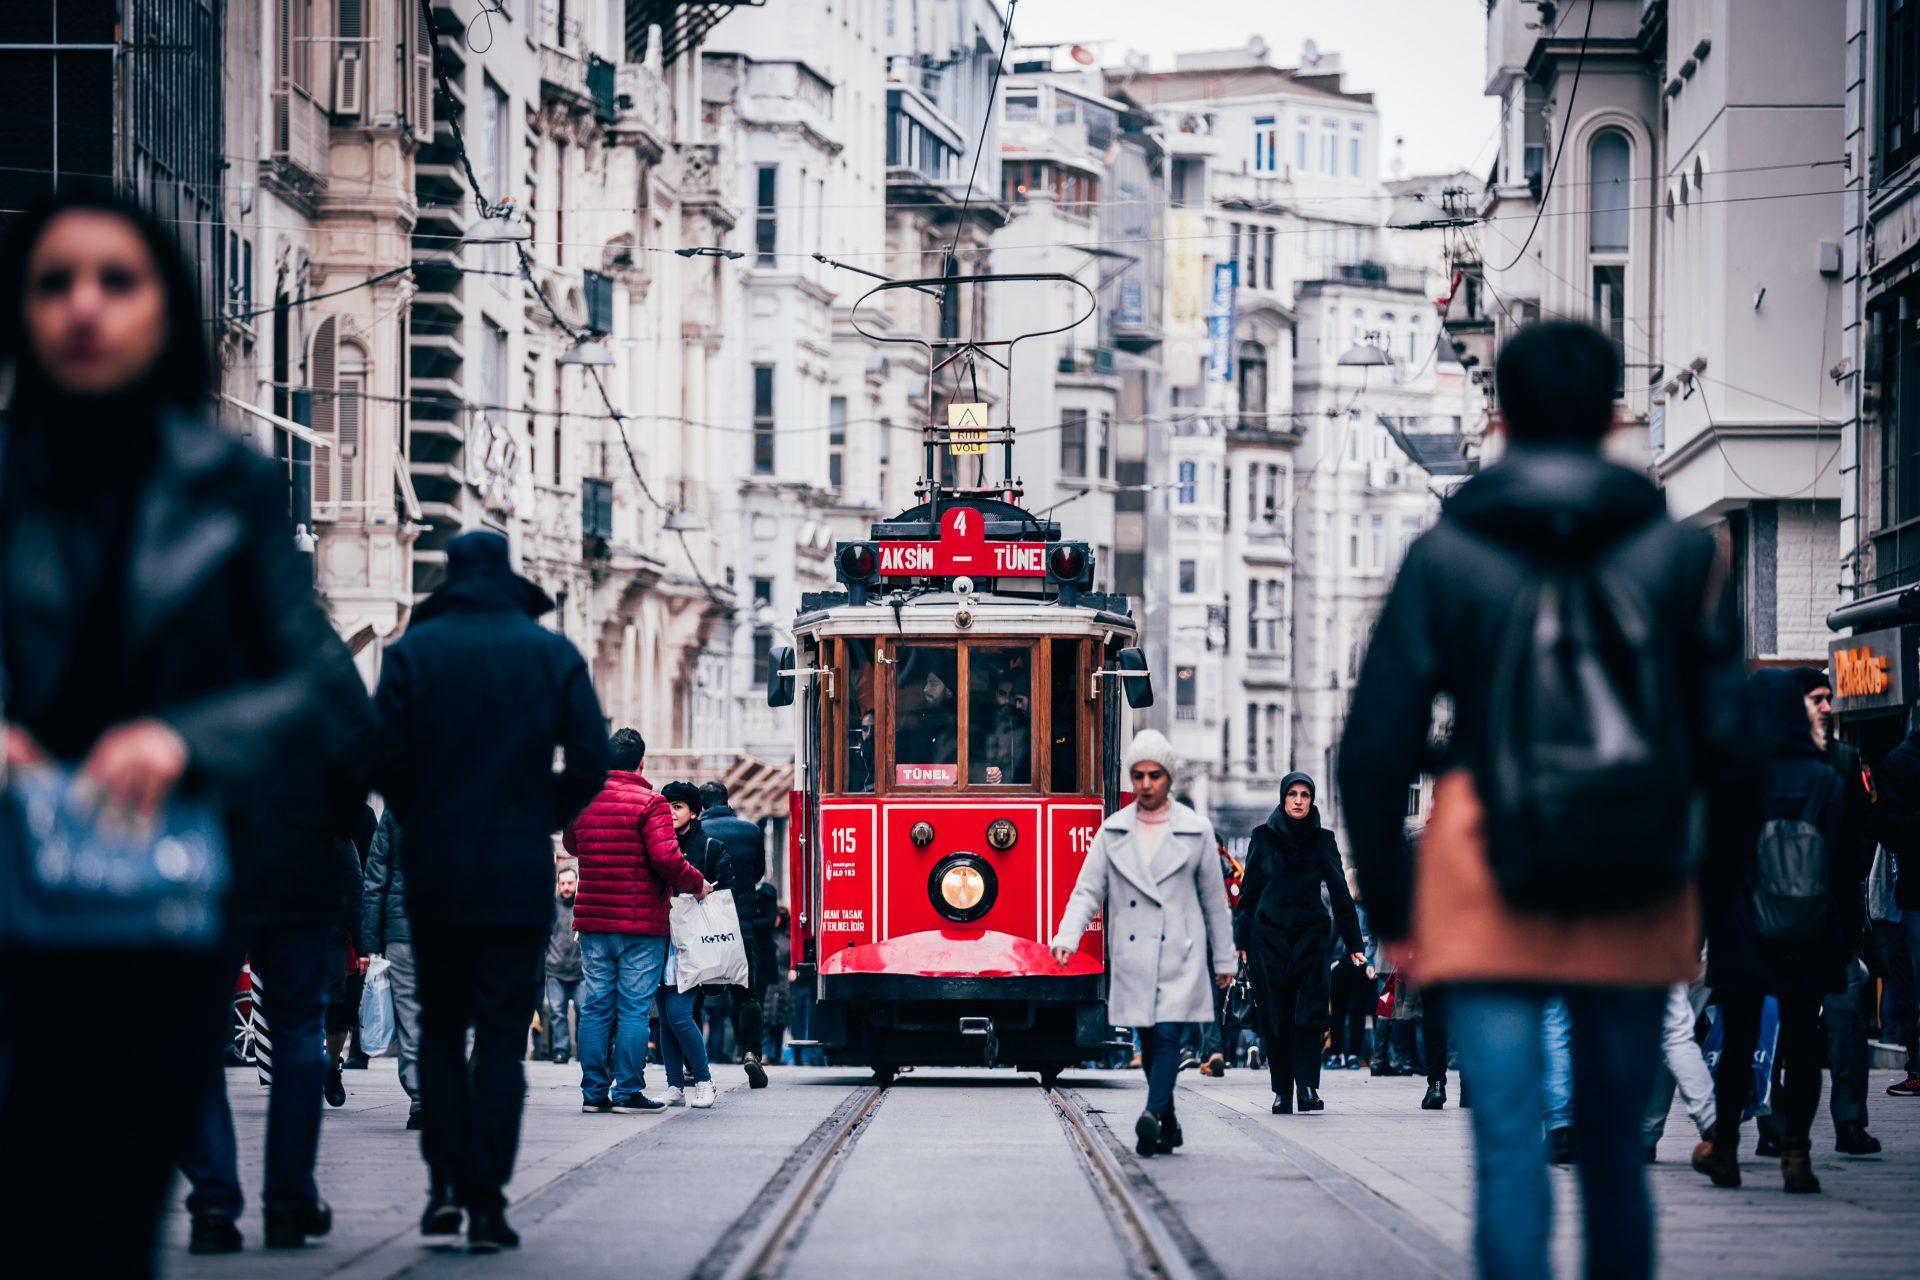 Turquía / Estambul, Istiklâl Caddesi